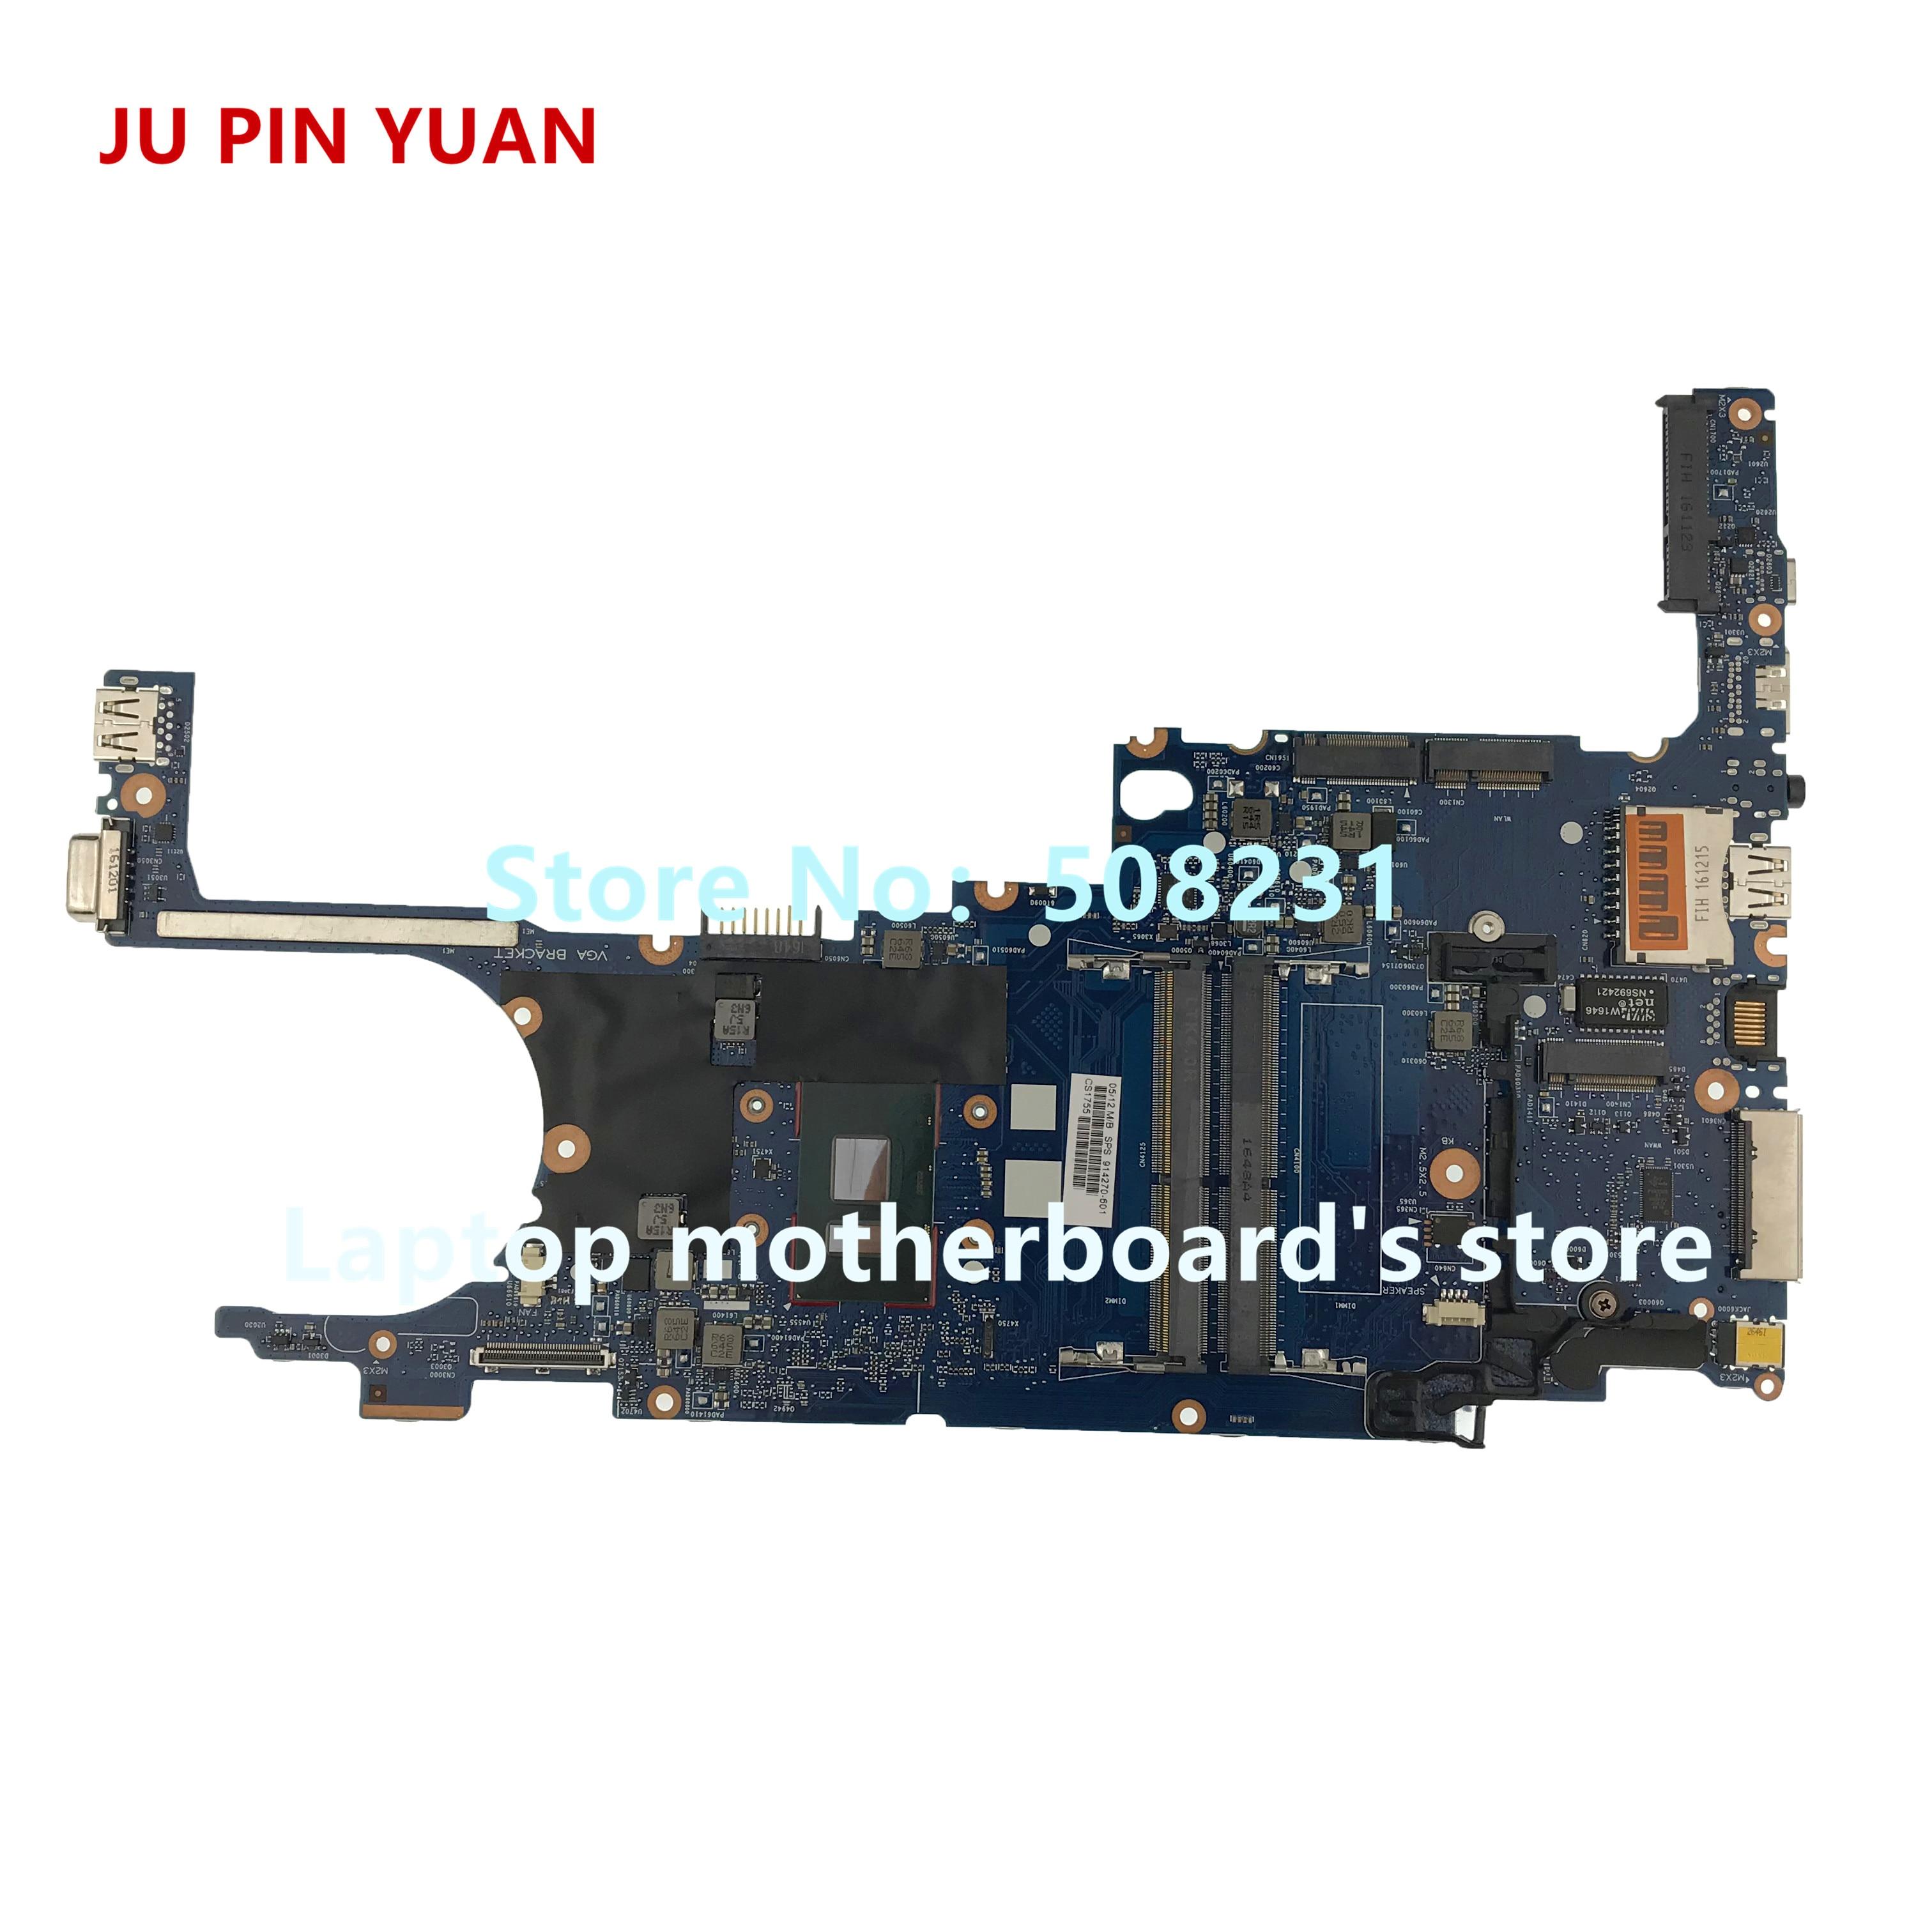 Laptop Motherboard Ju Pin Yuan 914270-601 914270-001 Laptop Motherboard Für Hp Elitebook 820 G4 Notebook Pc I3-7100u Voll Getestet